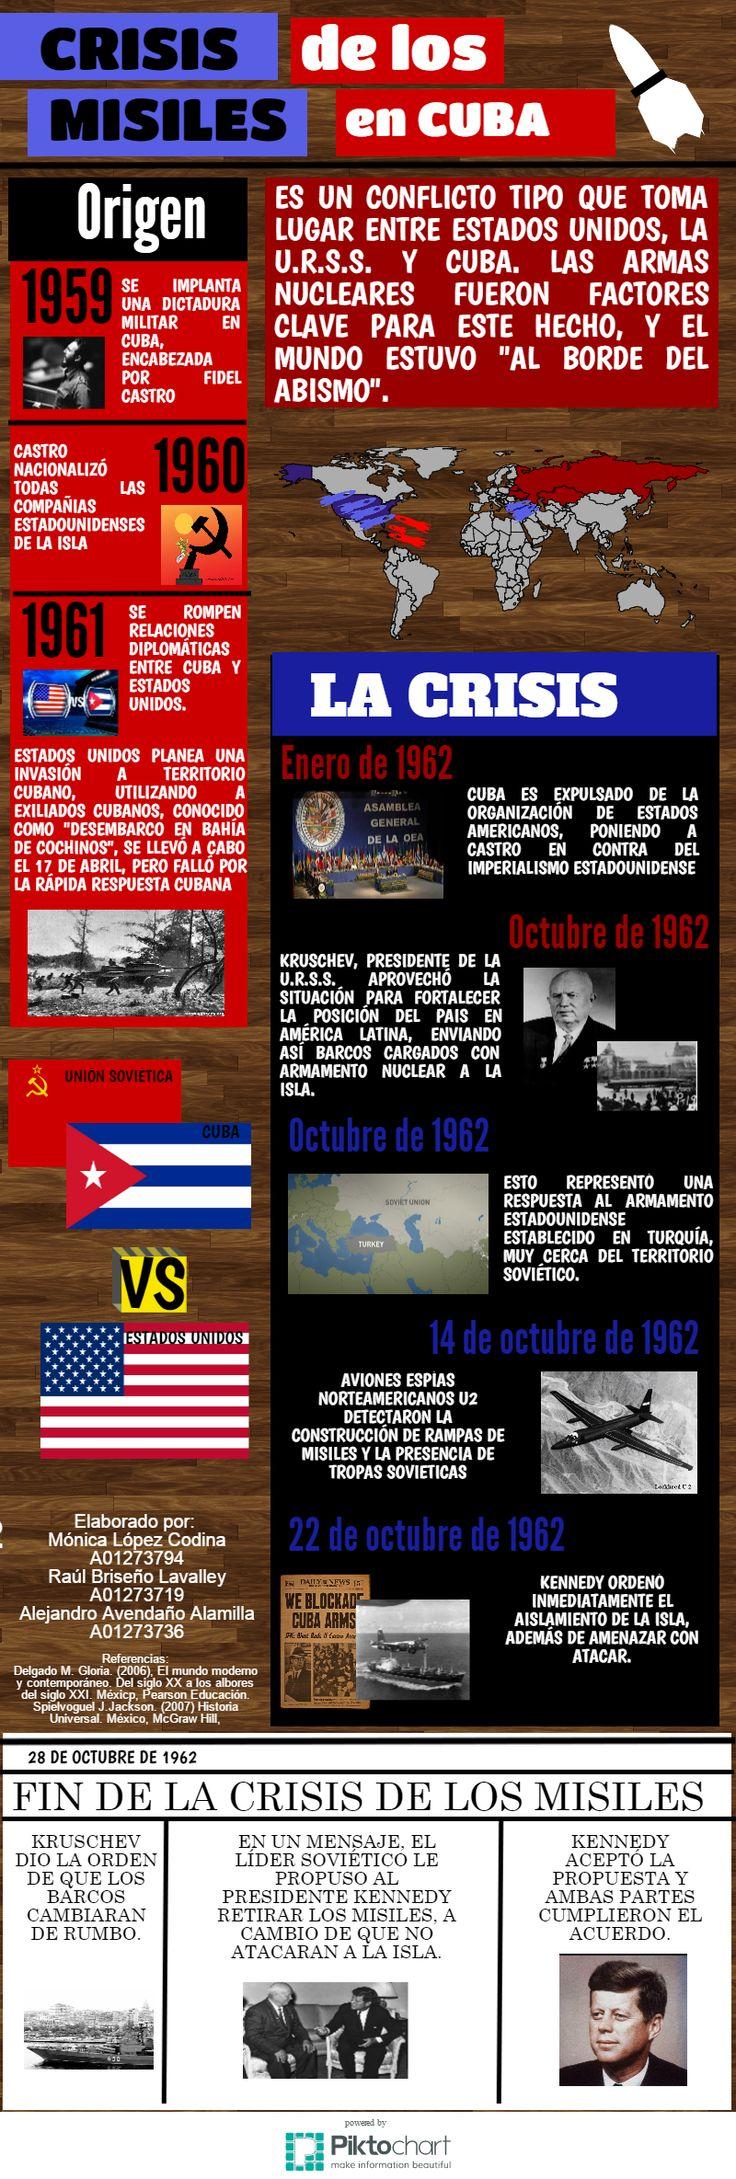 Crisis de los misiles ITESM Hidalgo  Elaborado por:  Mónica López Codina A01273794 Raúl Briseño Lavalley A01273719 Alejandro Avendaño Alamilla A01273736